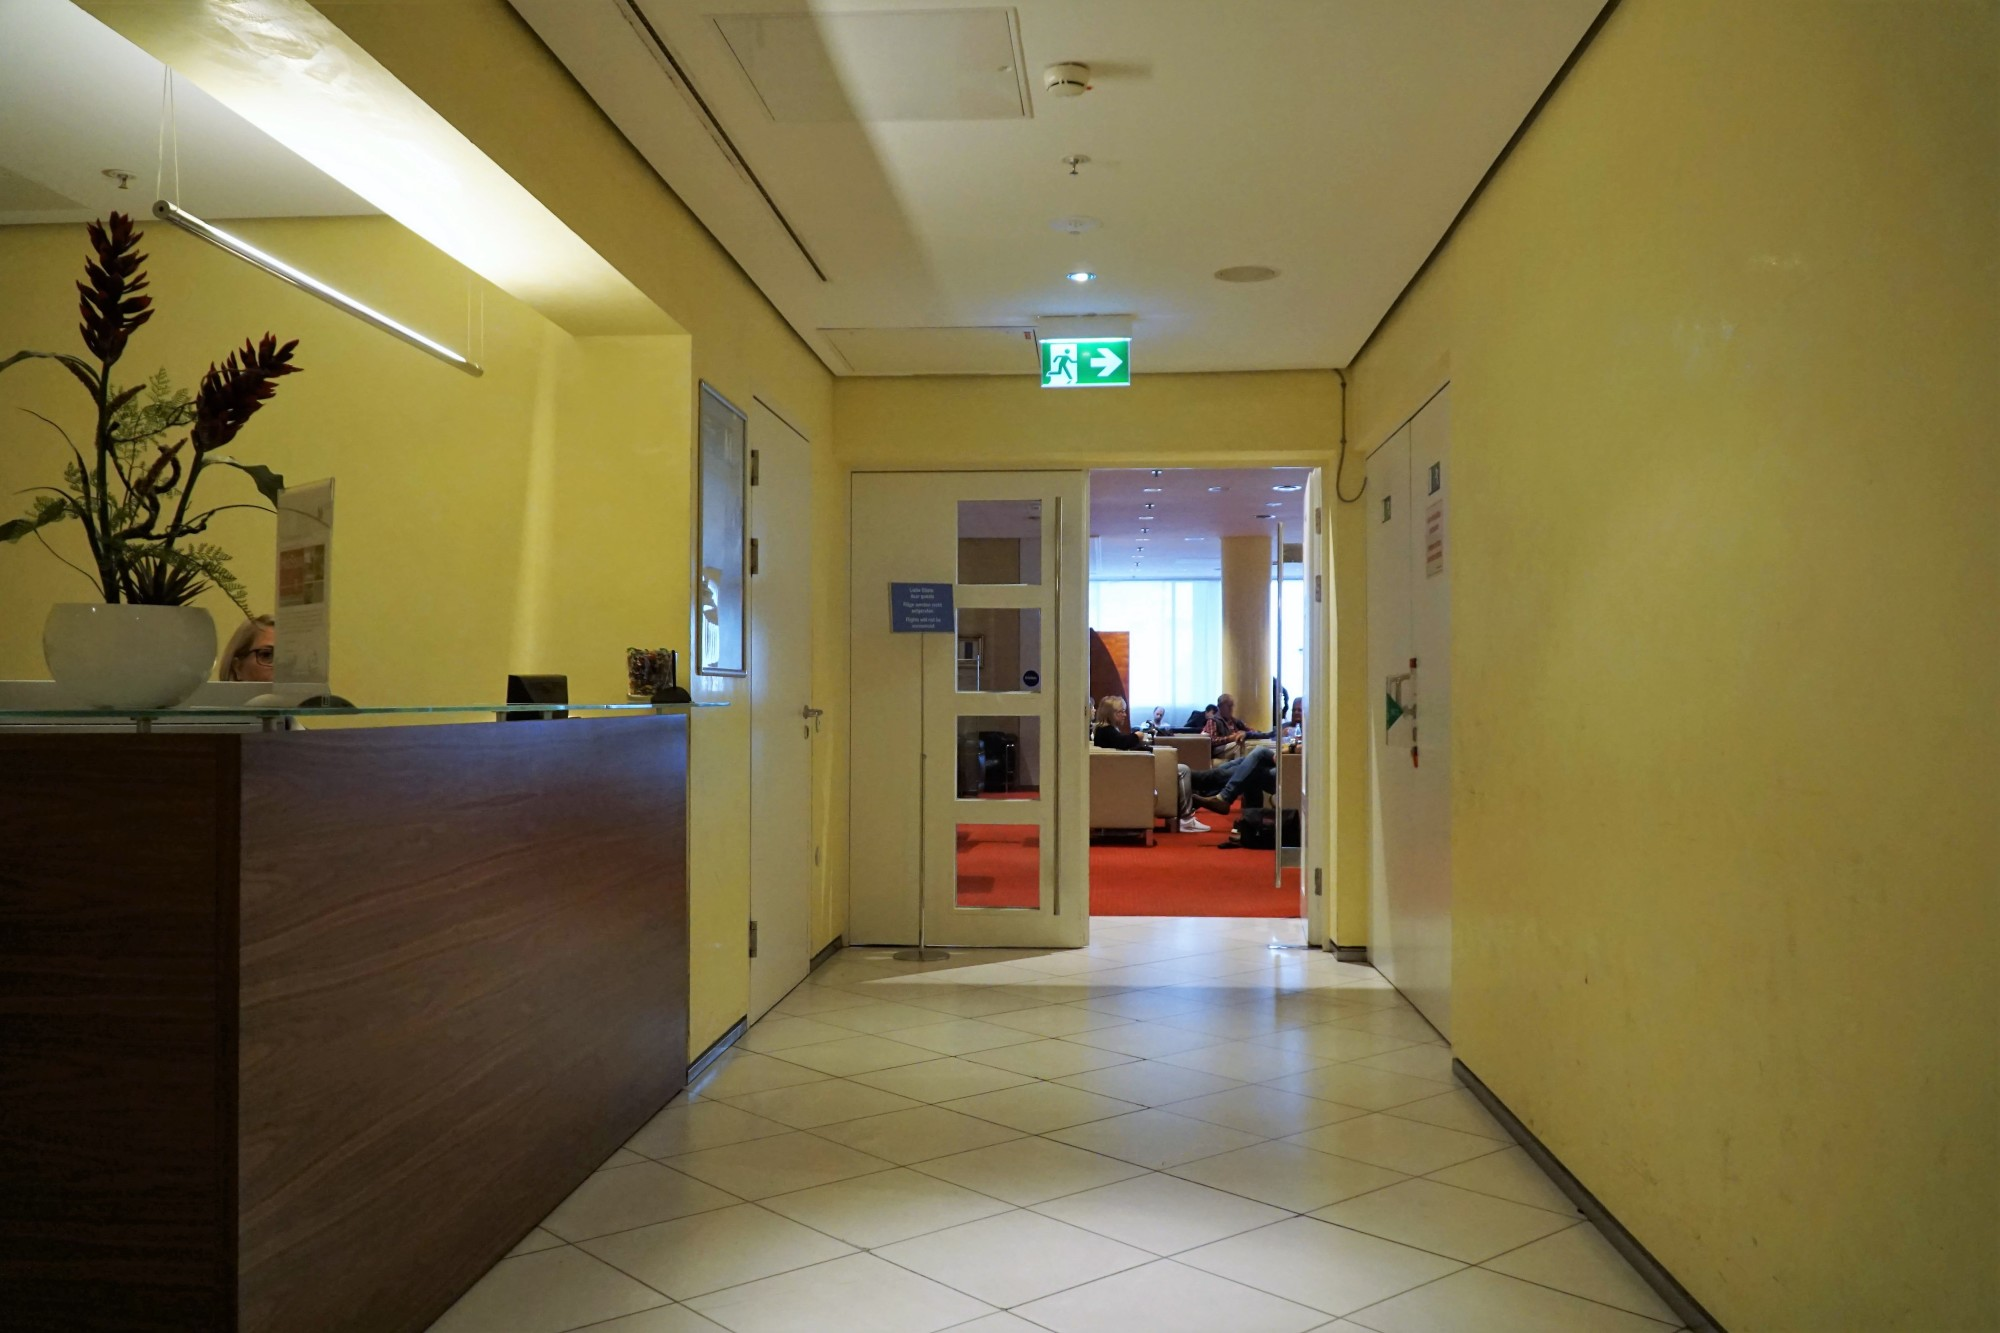 bizarr lounge berlin club monaco munich